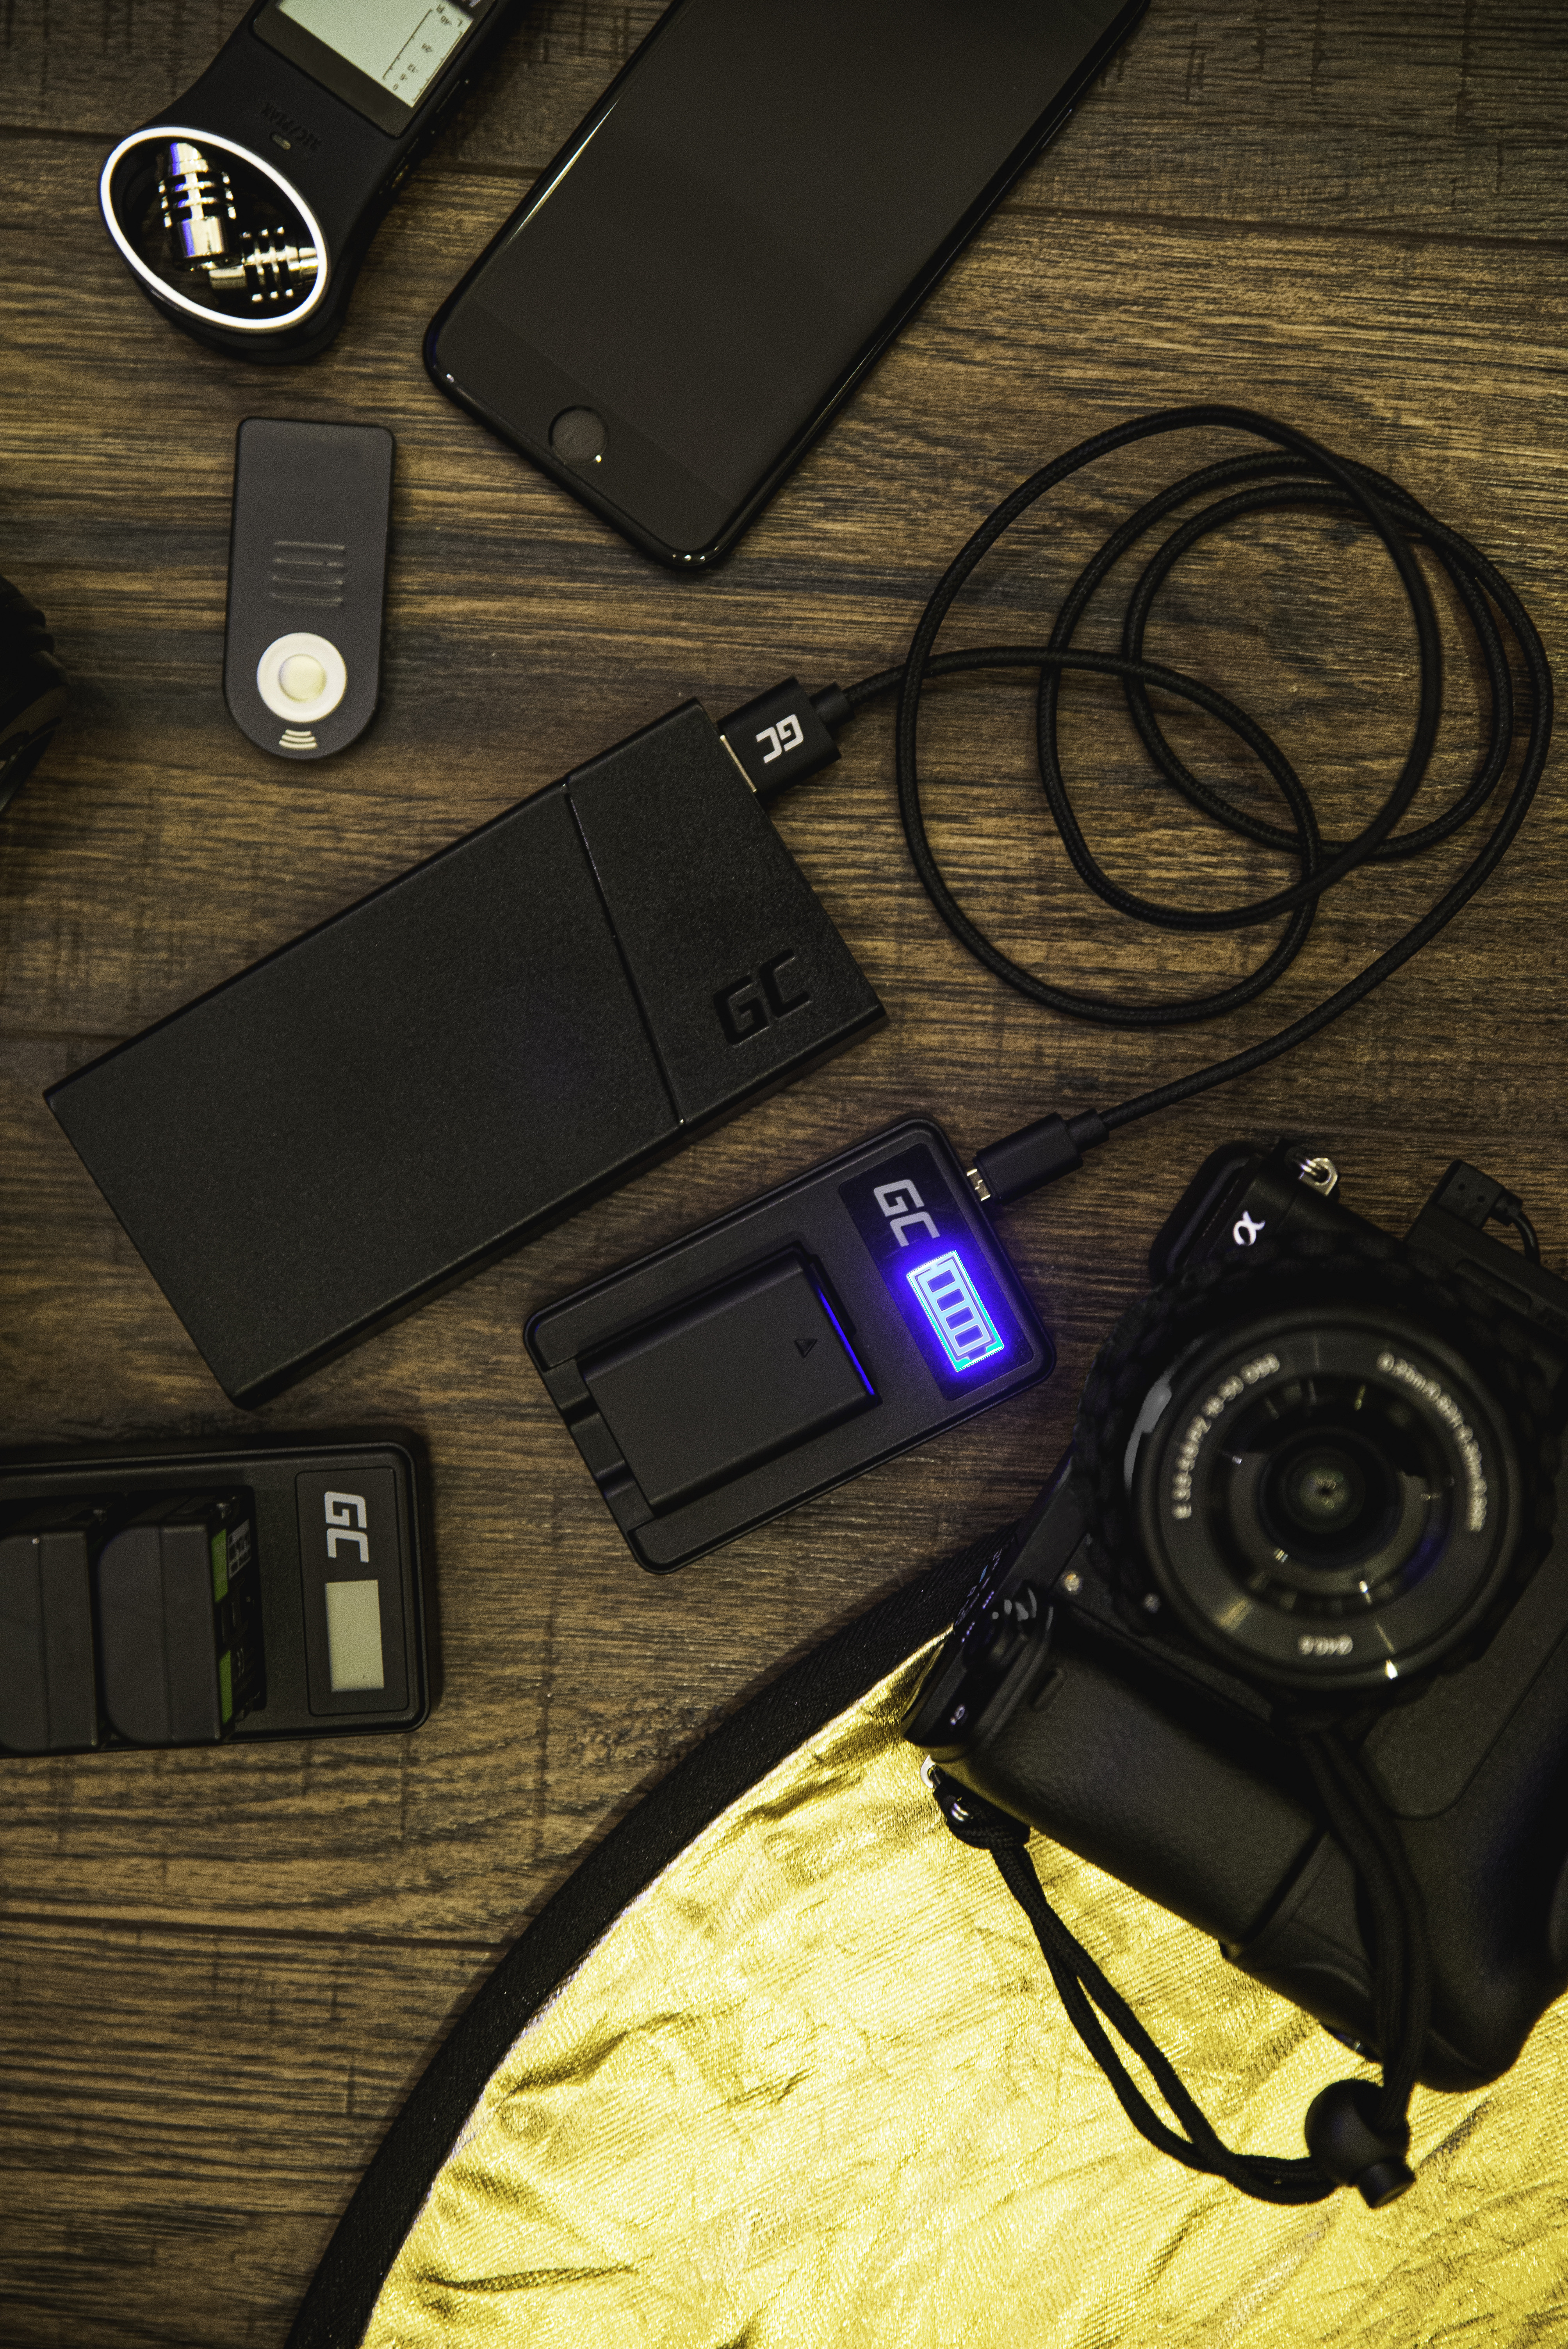 Charger AHBBP-301 Green Cell ® for AHDBT-201, AHDBT-301, GoPro HD Hero 3, GoPro HD Hero 3+